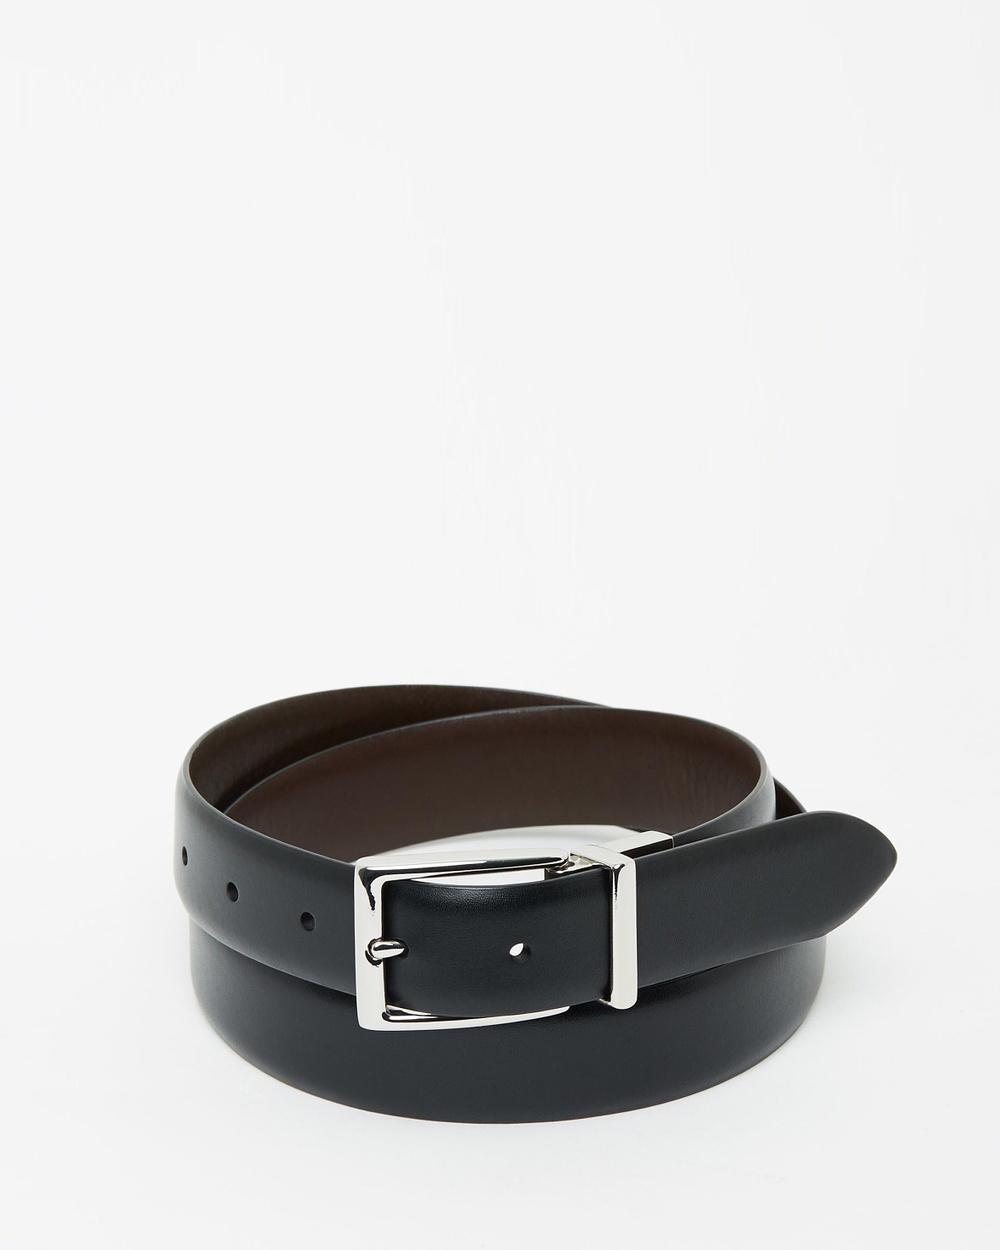 Polo Ralph Lauren Reversible Leather Belt Belts Black & Brown